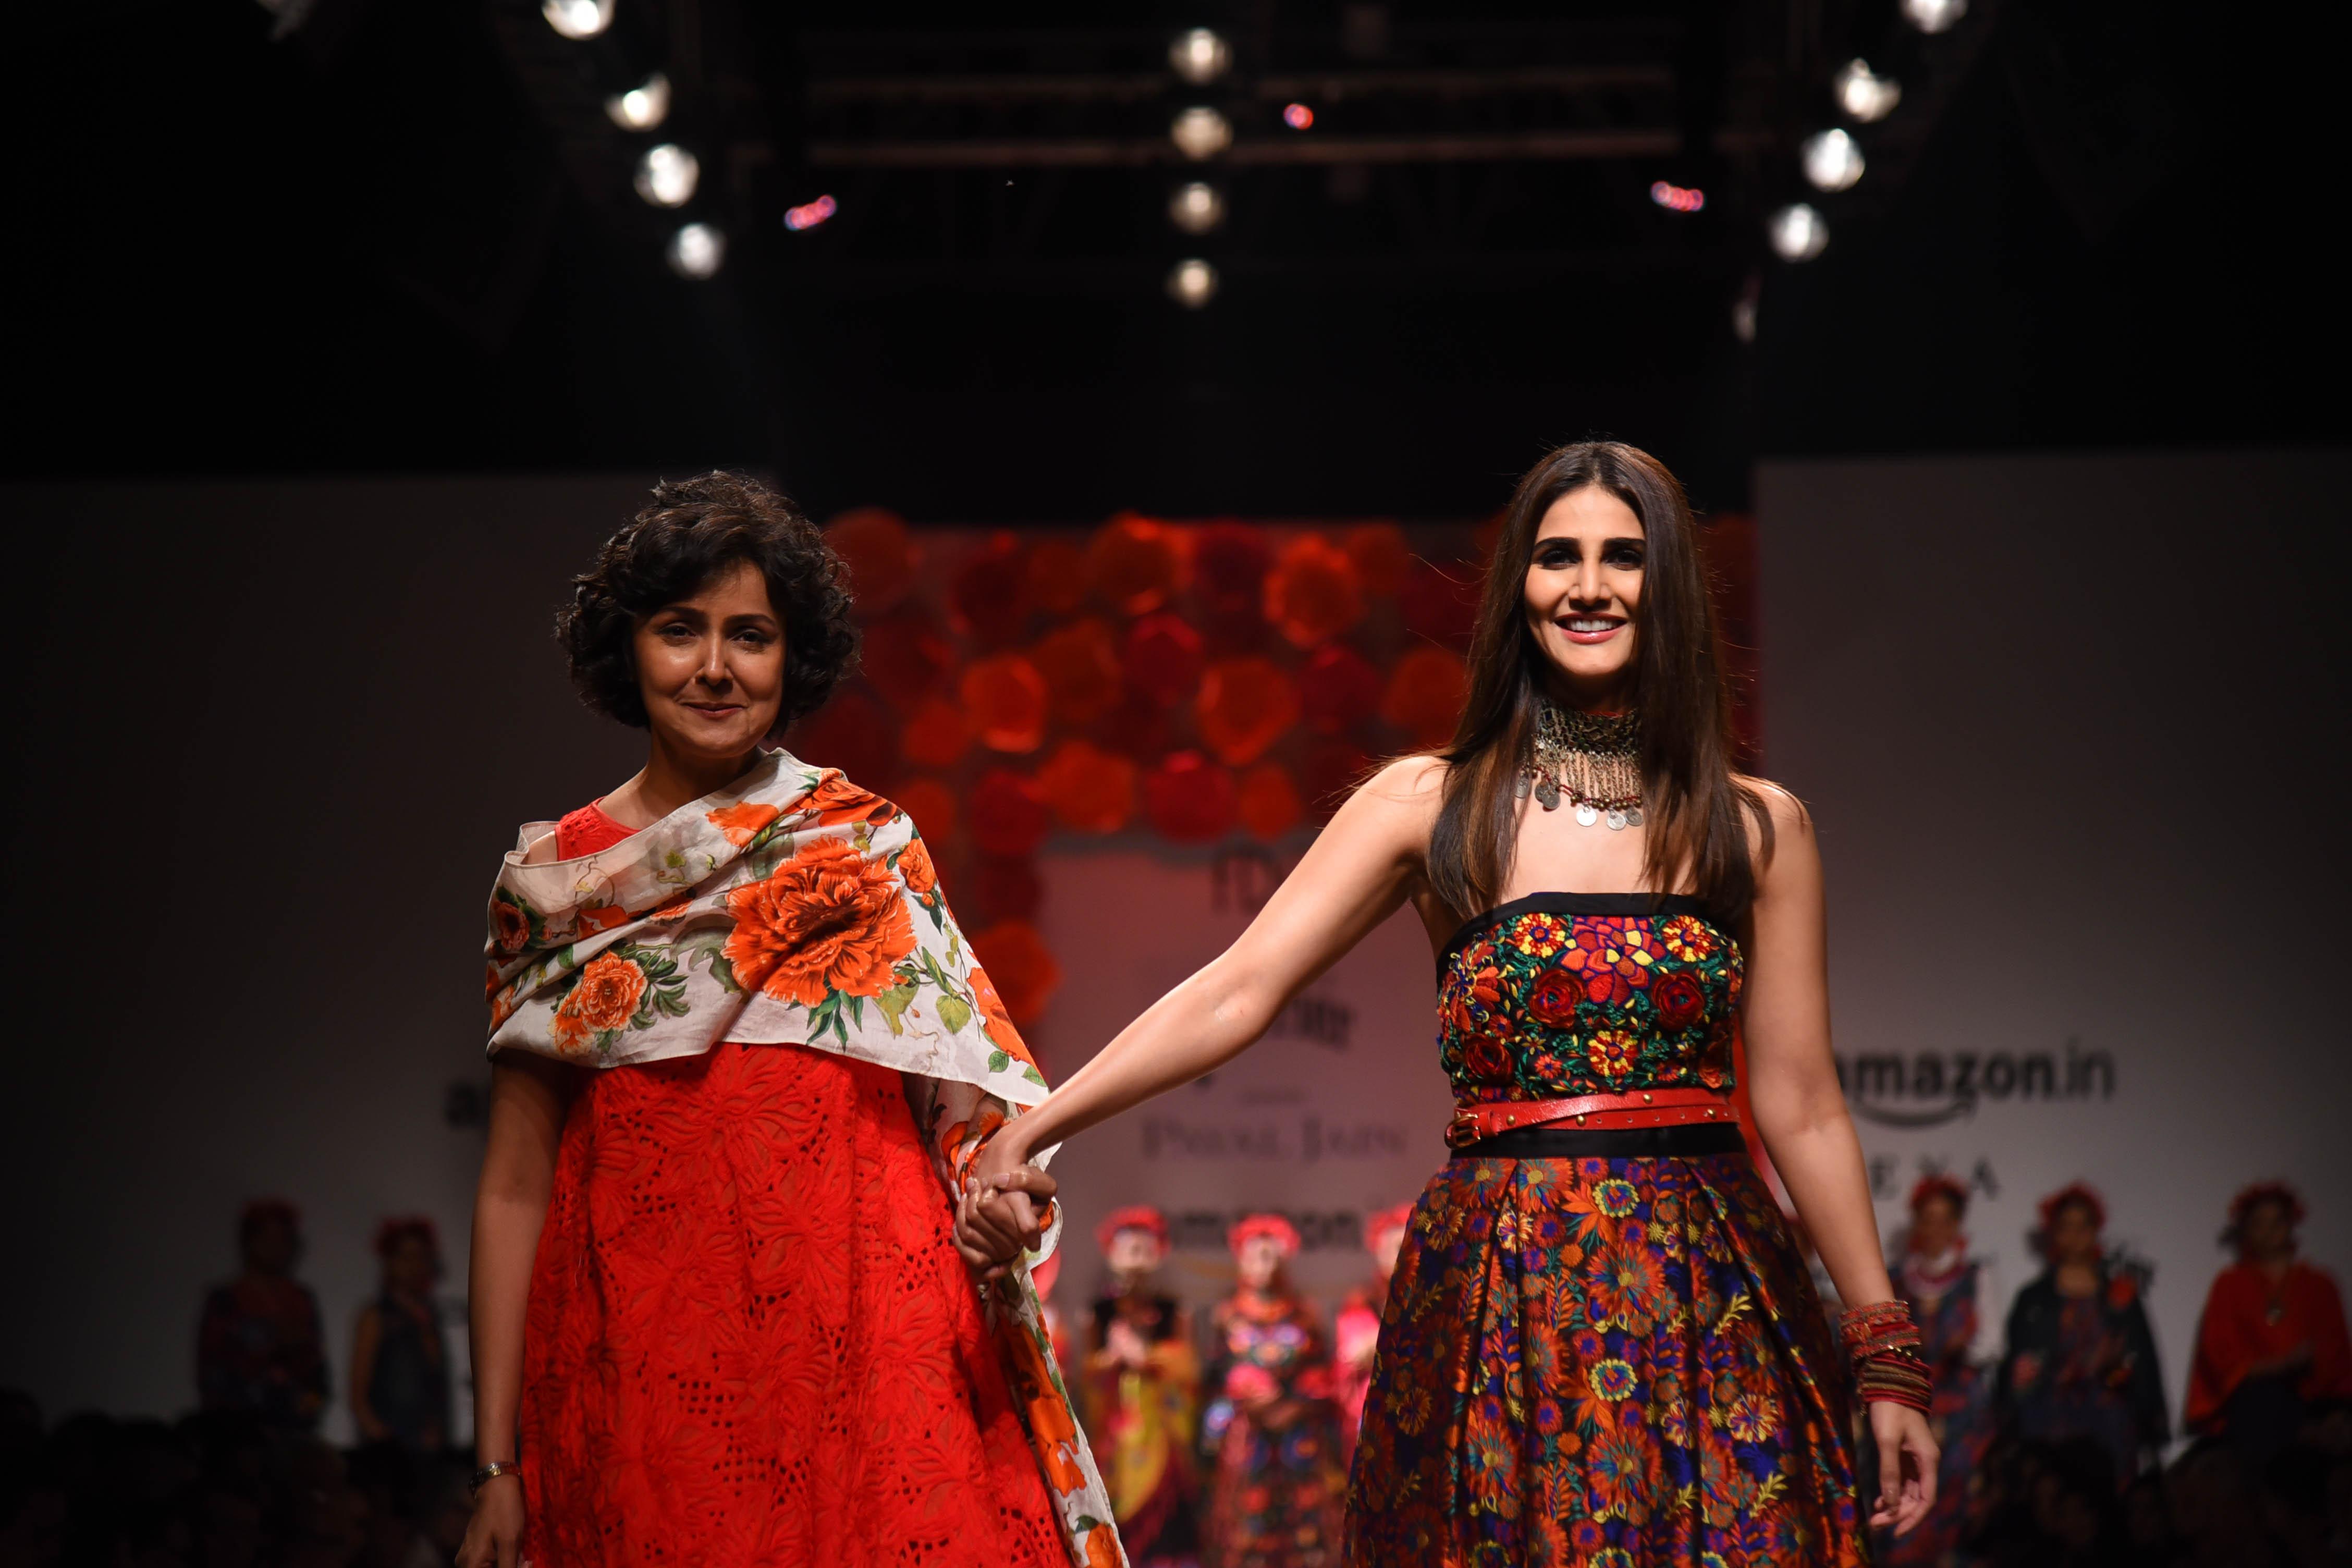 Designer Payal Jain with Actor Vaani Kapoor at Amazon India Fashion Week SS'18